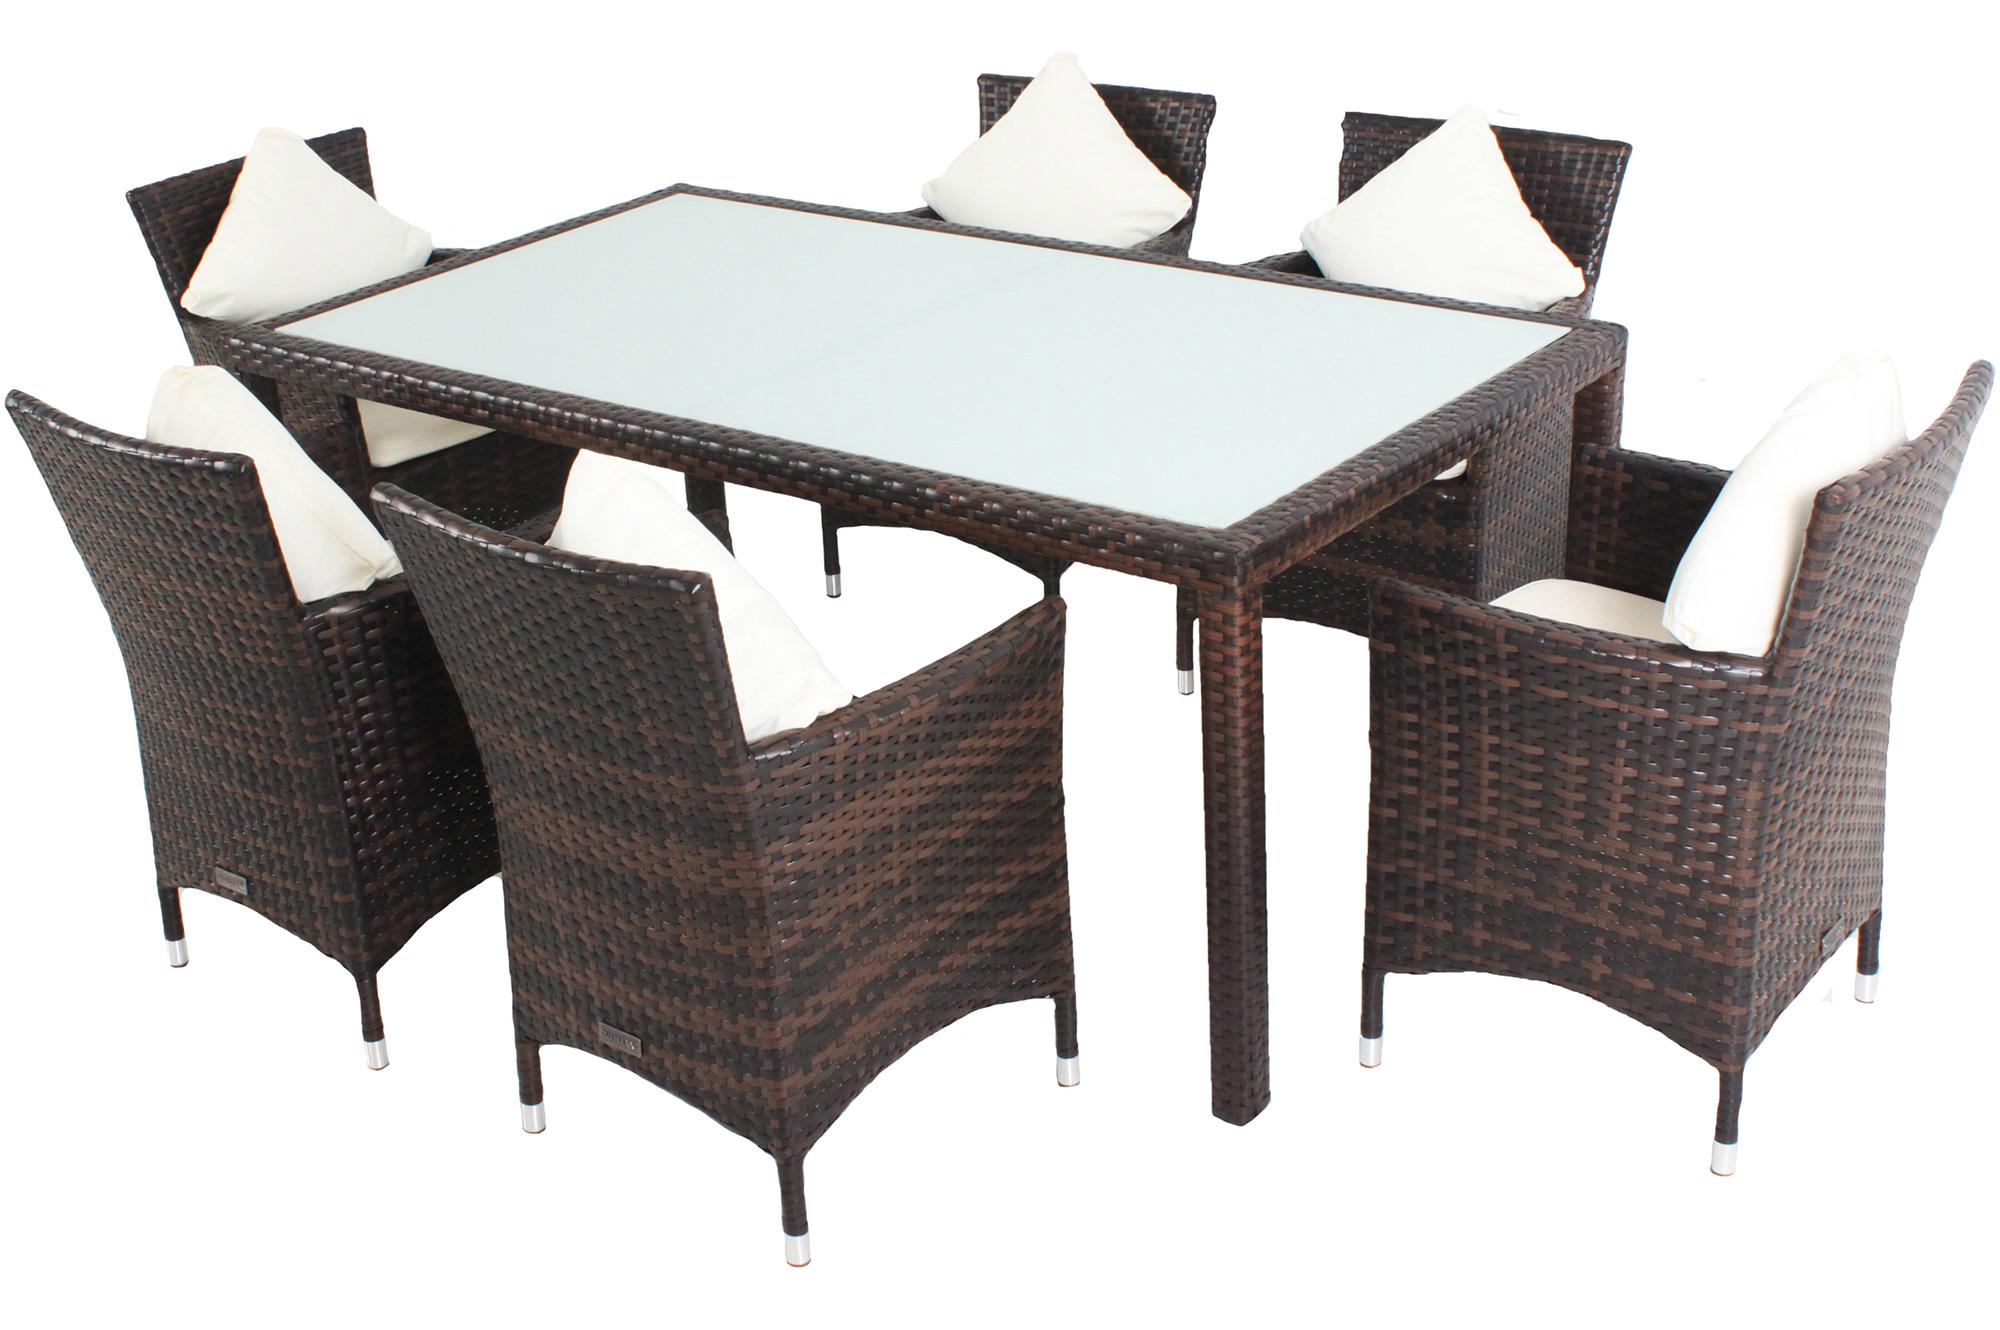 outflexx gartenm belset aus polyrattan. Black Bedroom Furniture Sets. Home Design Ideas